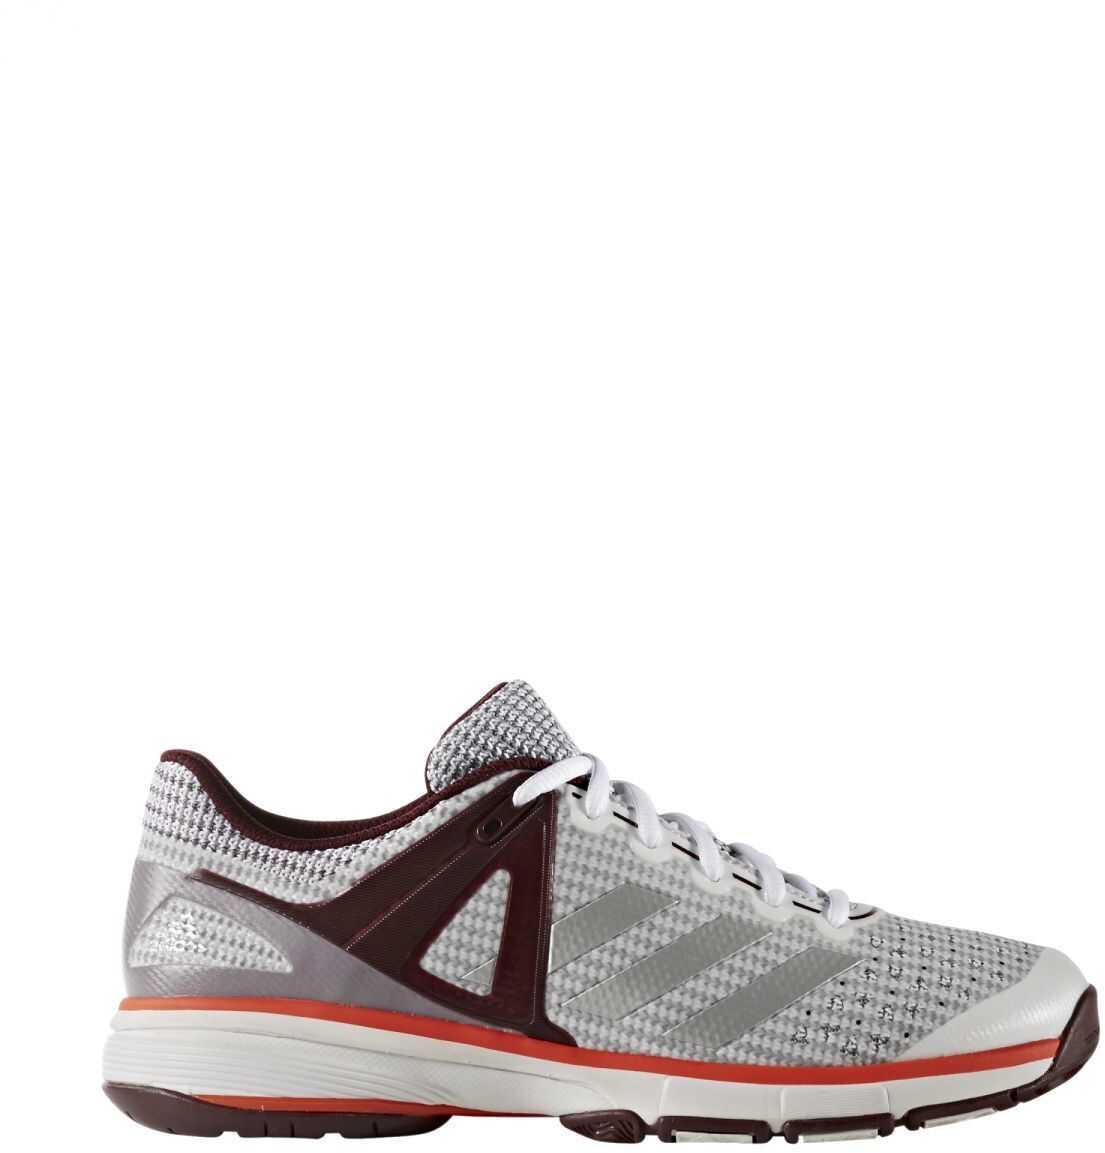 adidas Court Stabil 13 W FTWWHT/SILVMT/MAROON